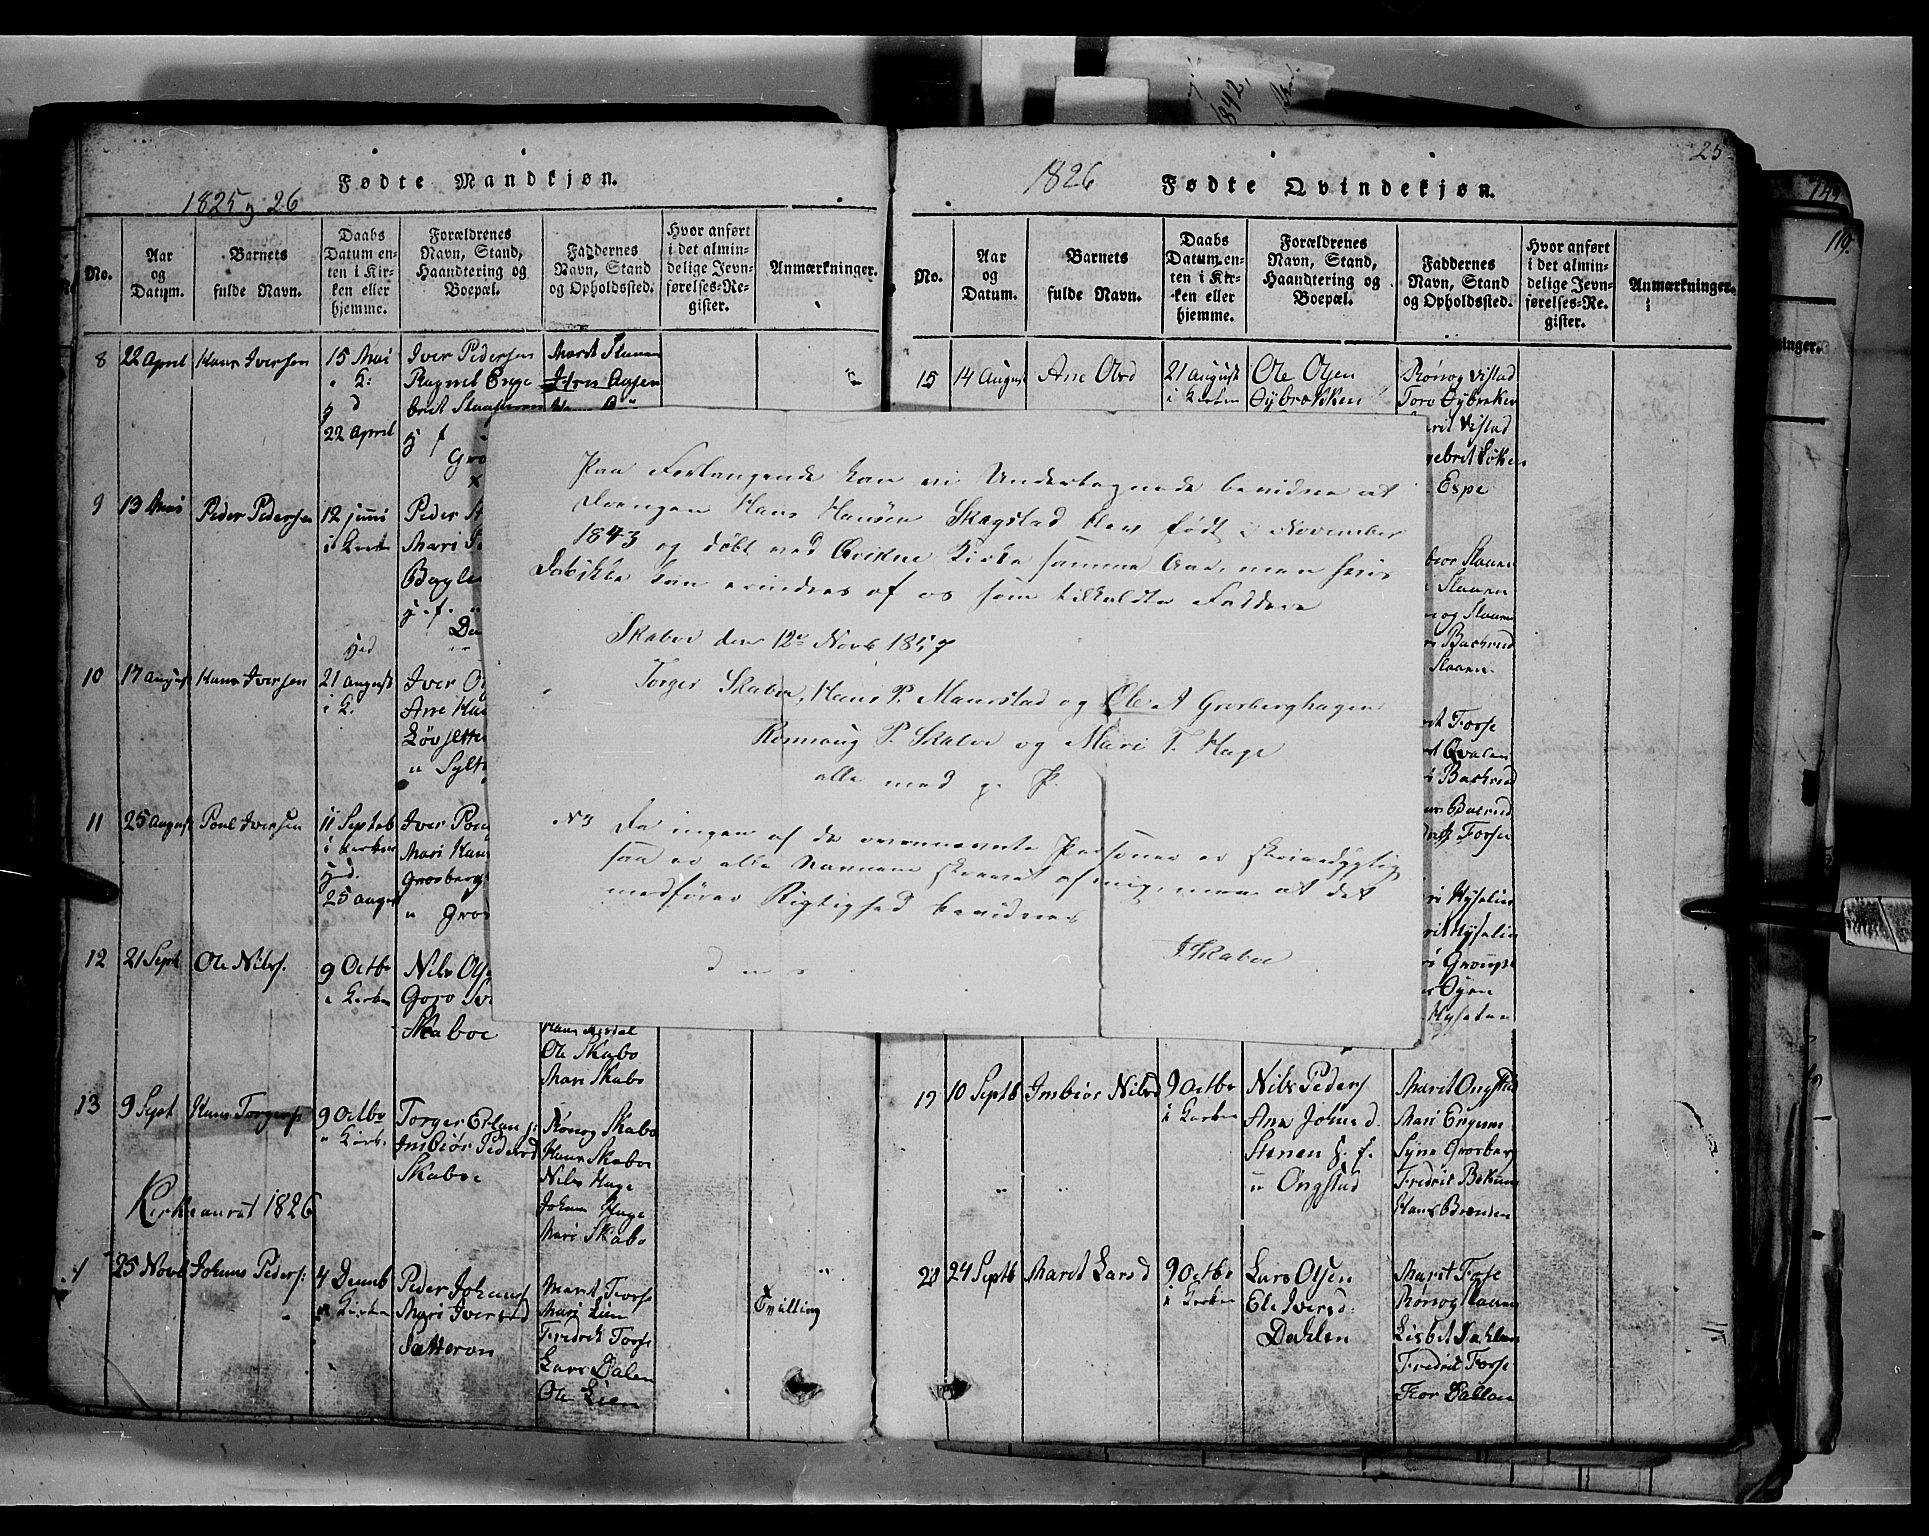 SAH, Fron prestekontor, H/Ha/Hab/L0003: Klokkerbok nr. 3, 1816-1850, s. 25